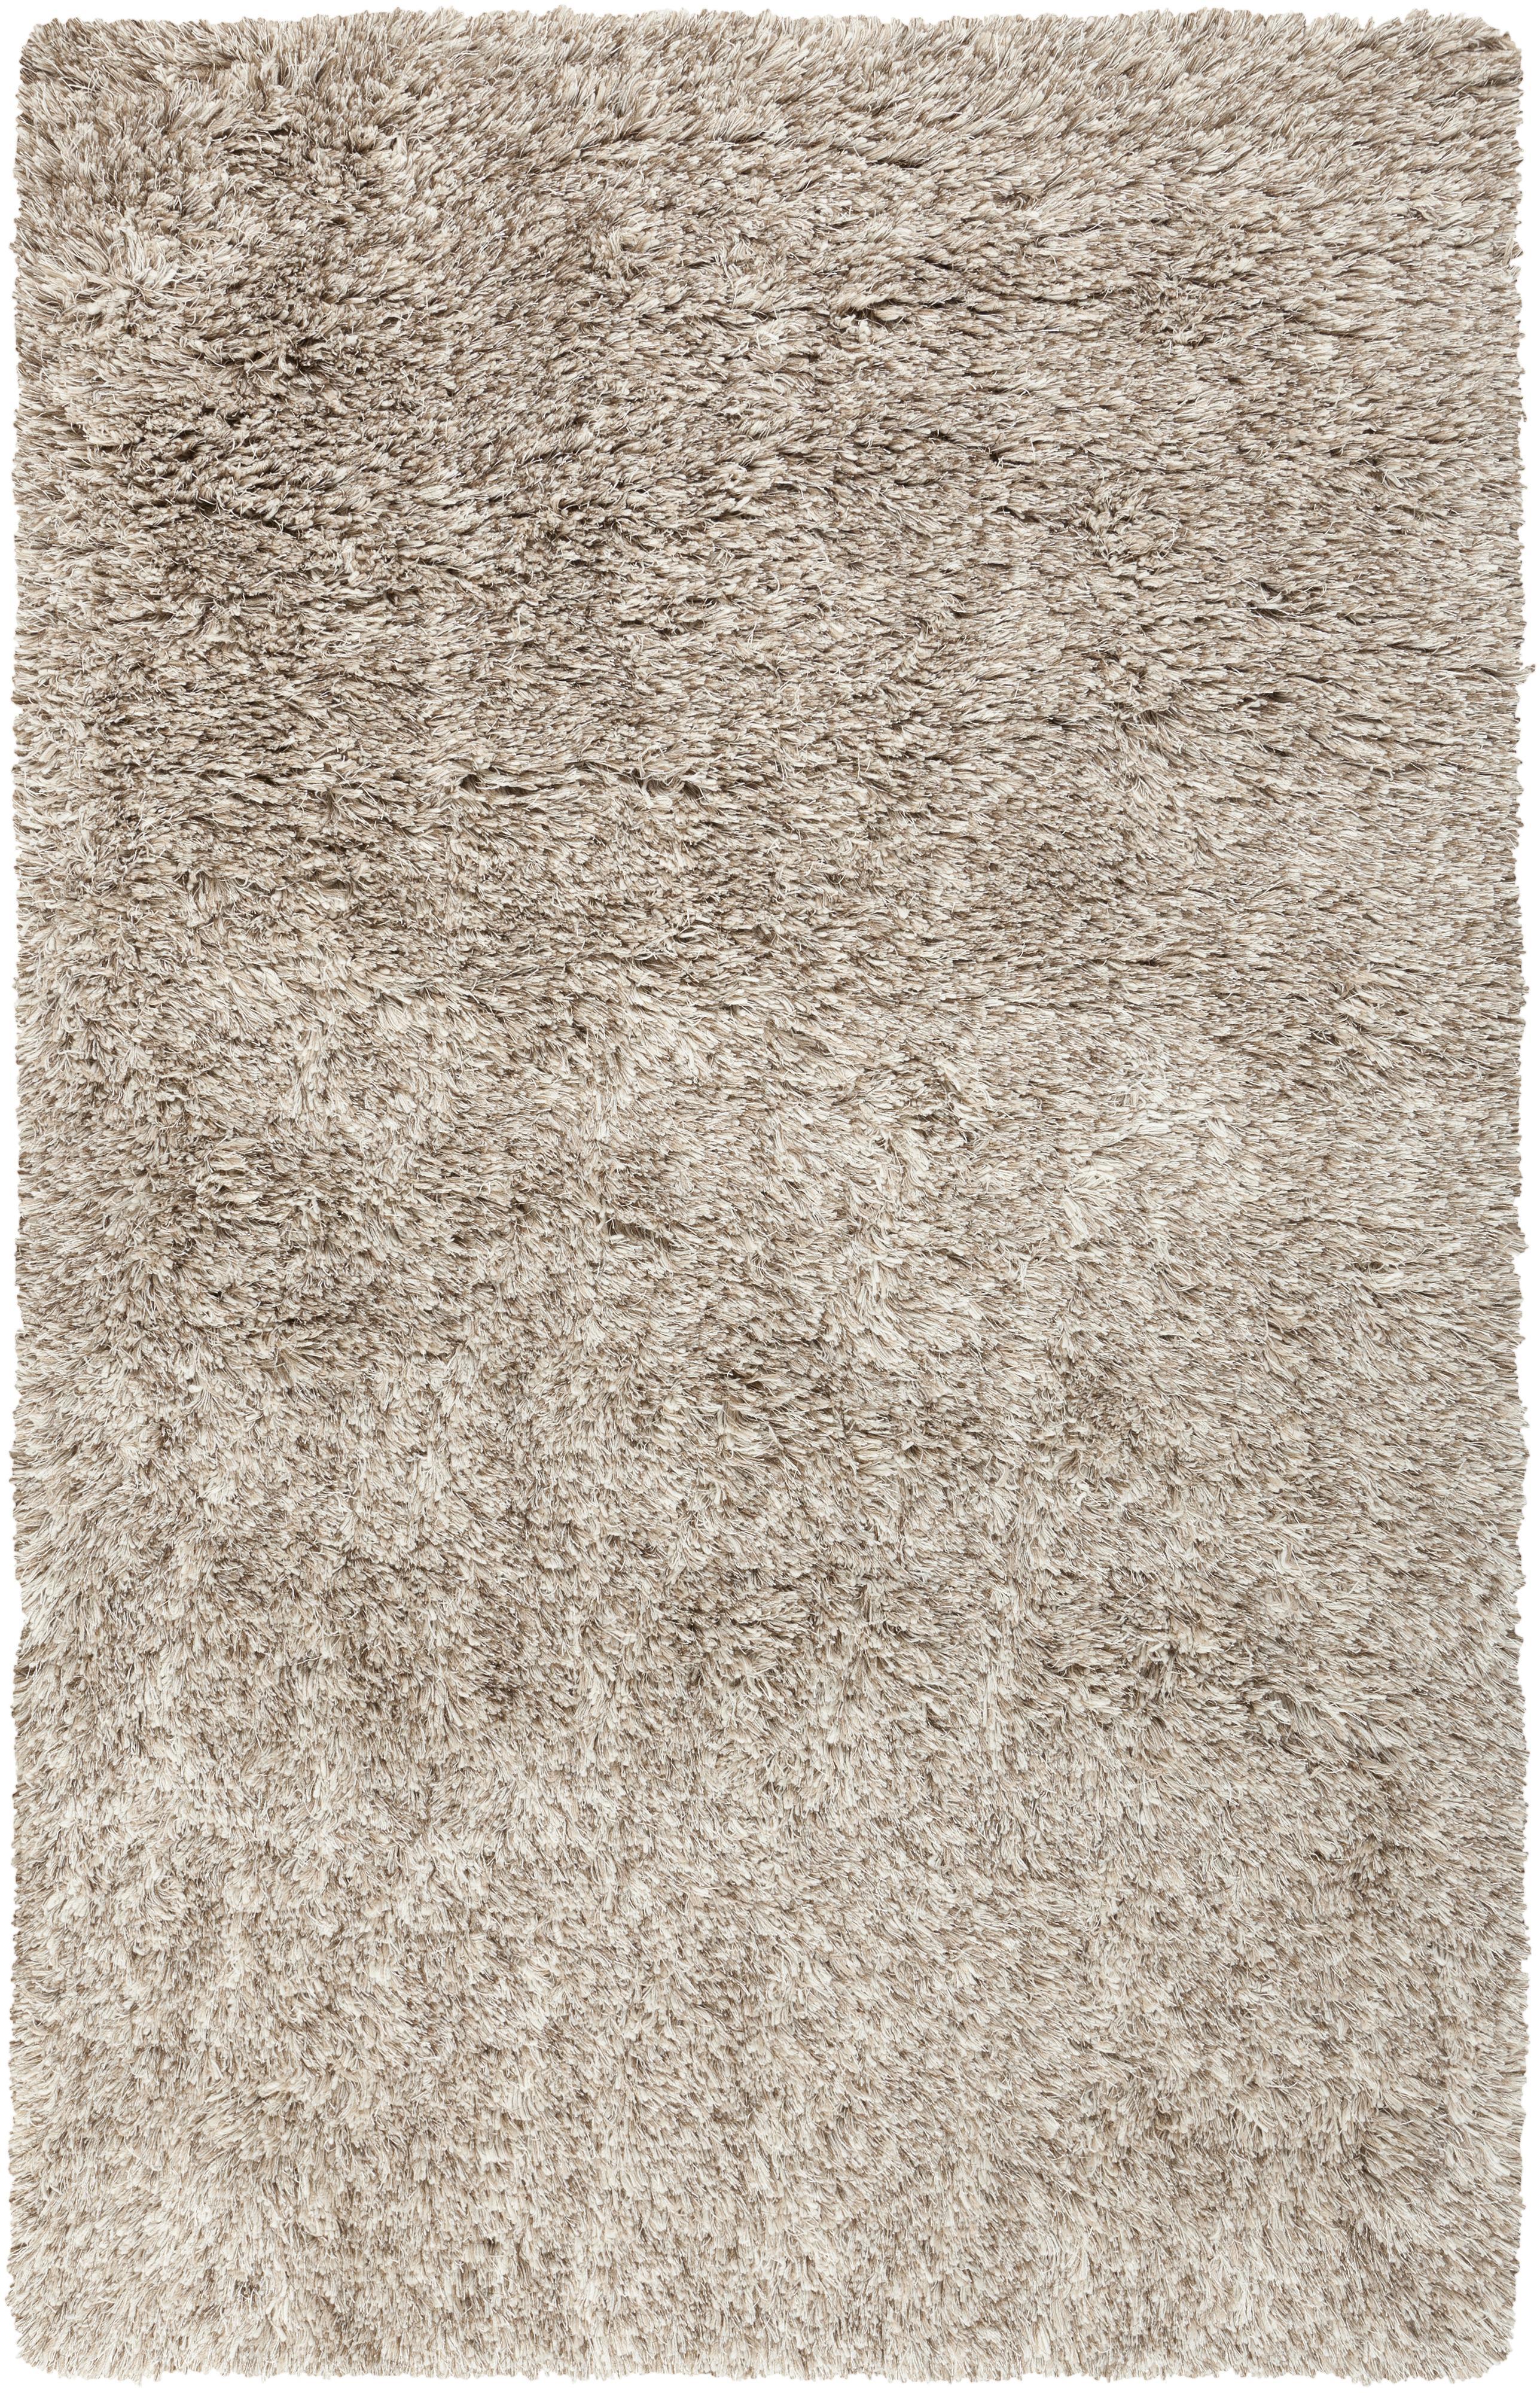 Surya Rugs Milan 8' x 10' - Item Number: MIL5001-810